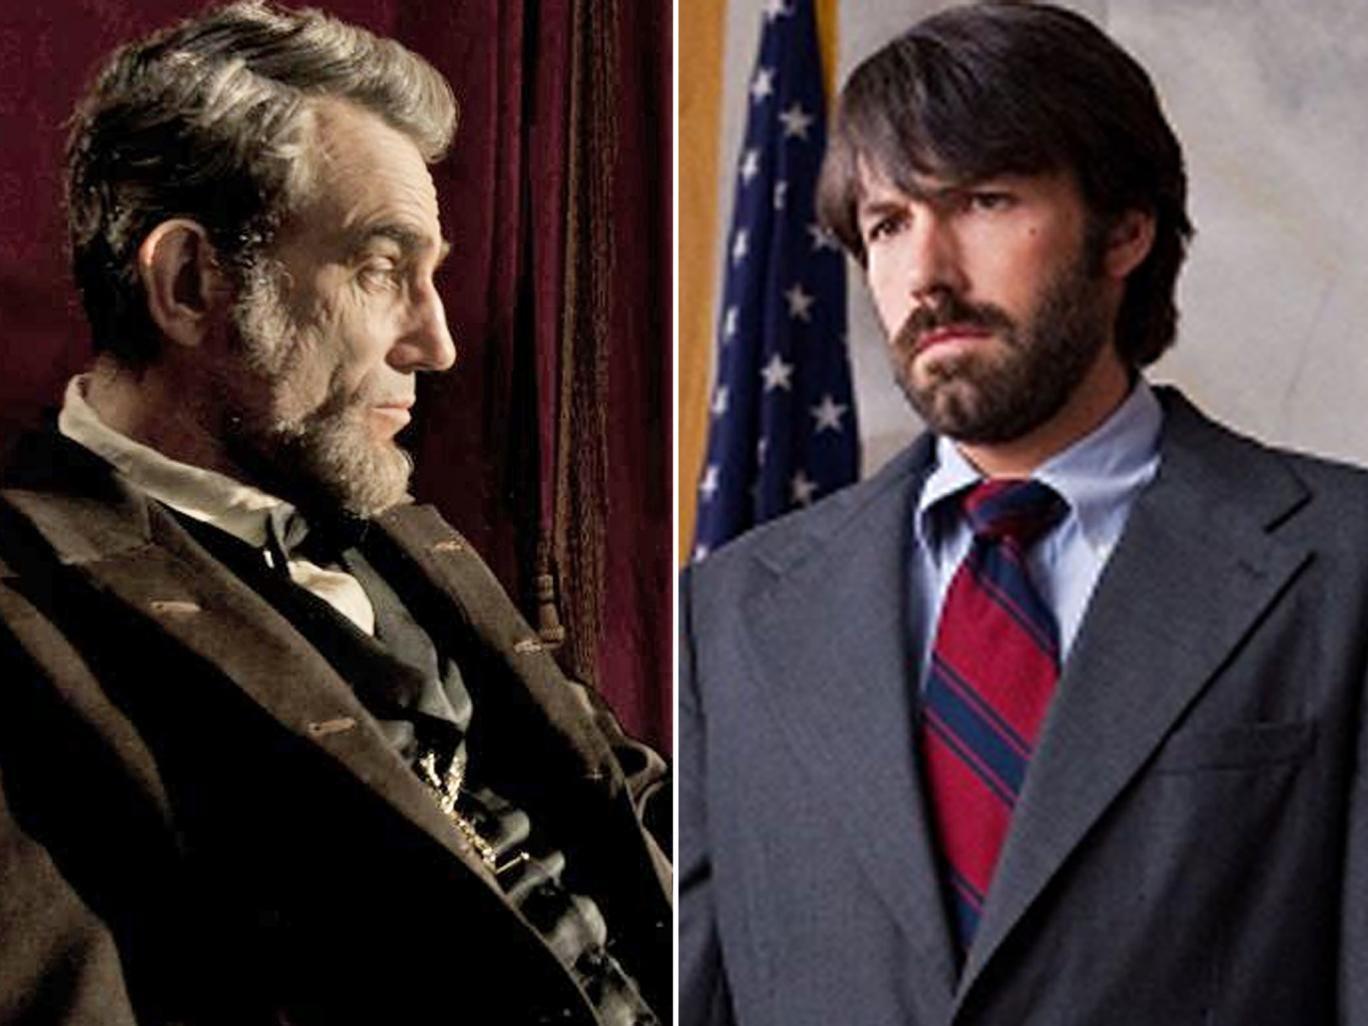 Oscar hopefuls: Daniel Day- Lewis in 'Lincoln', left, and Ben Affleck in 'Argo'